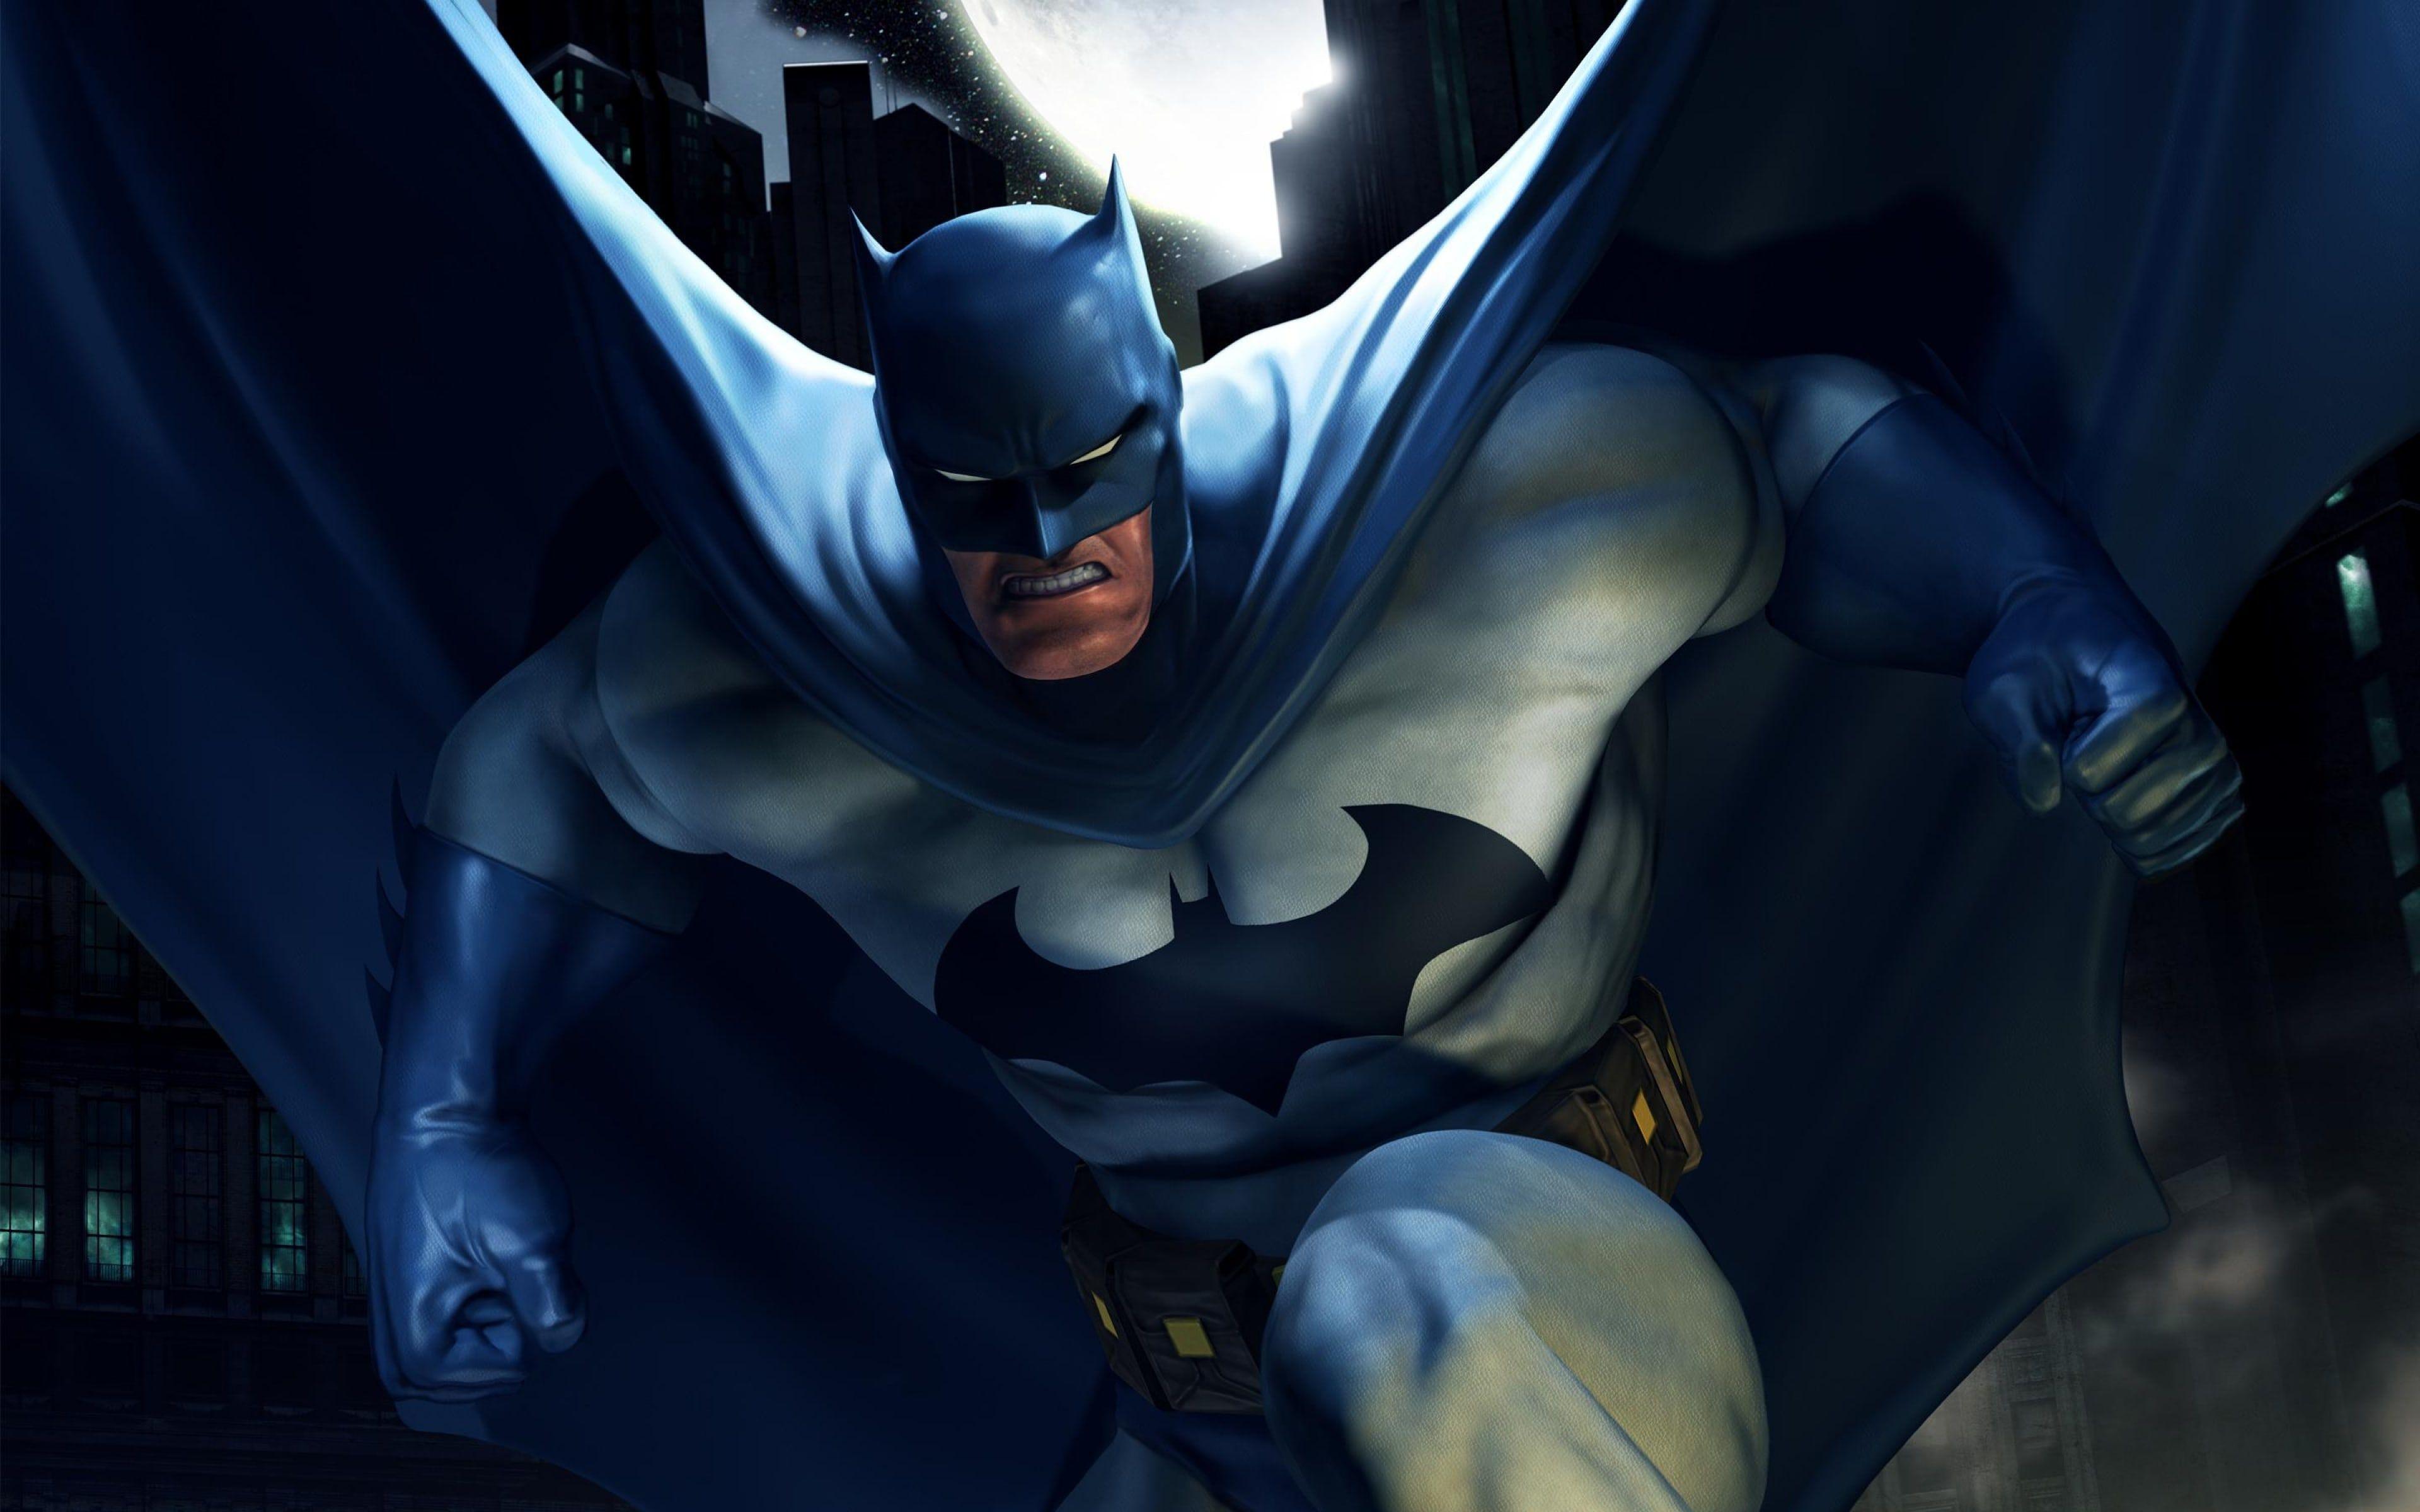 batman superhero dc comics | batman superhero and superheroes